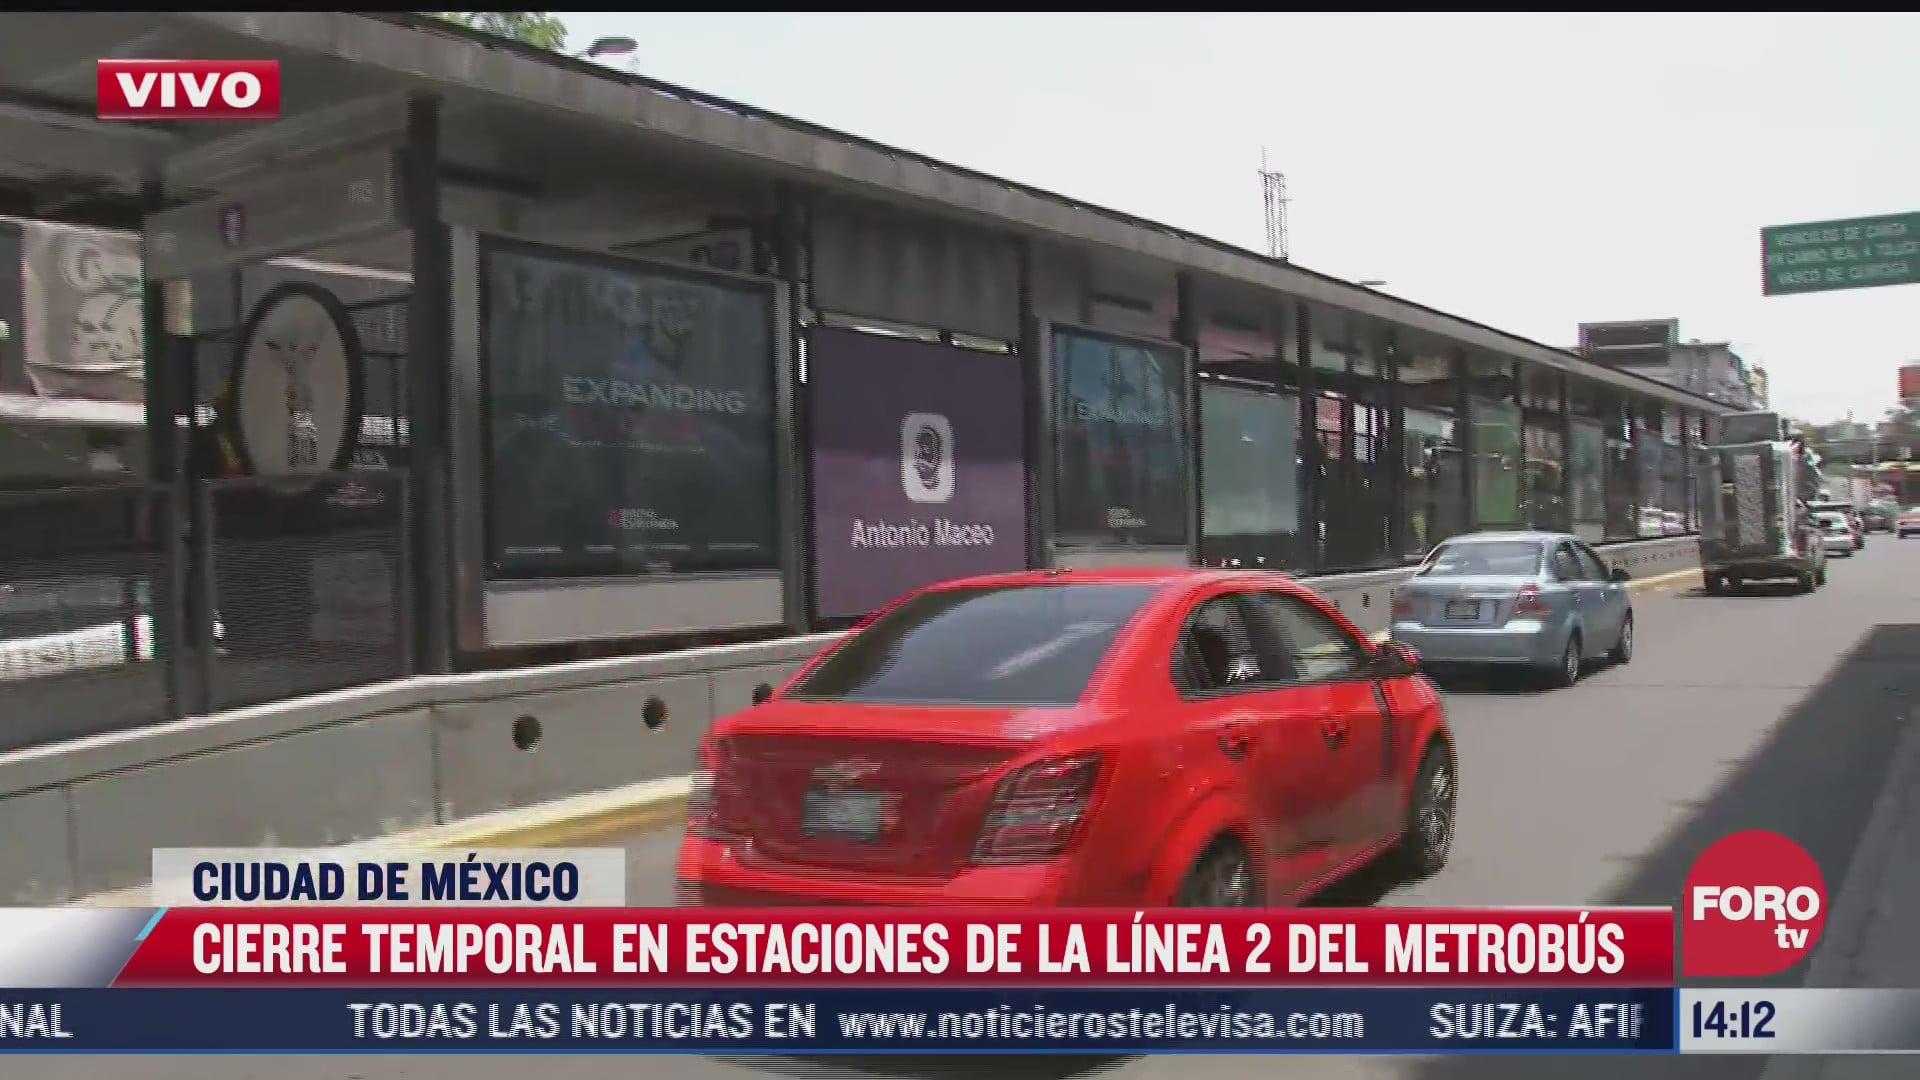 inicia cierre temporal de estaciones de l2 del metrobus